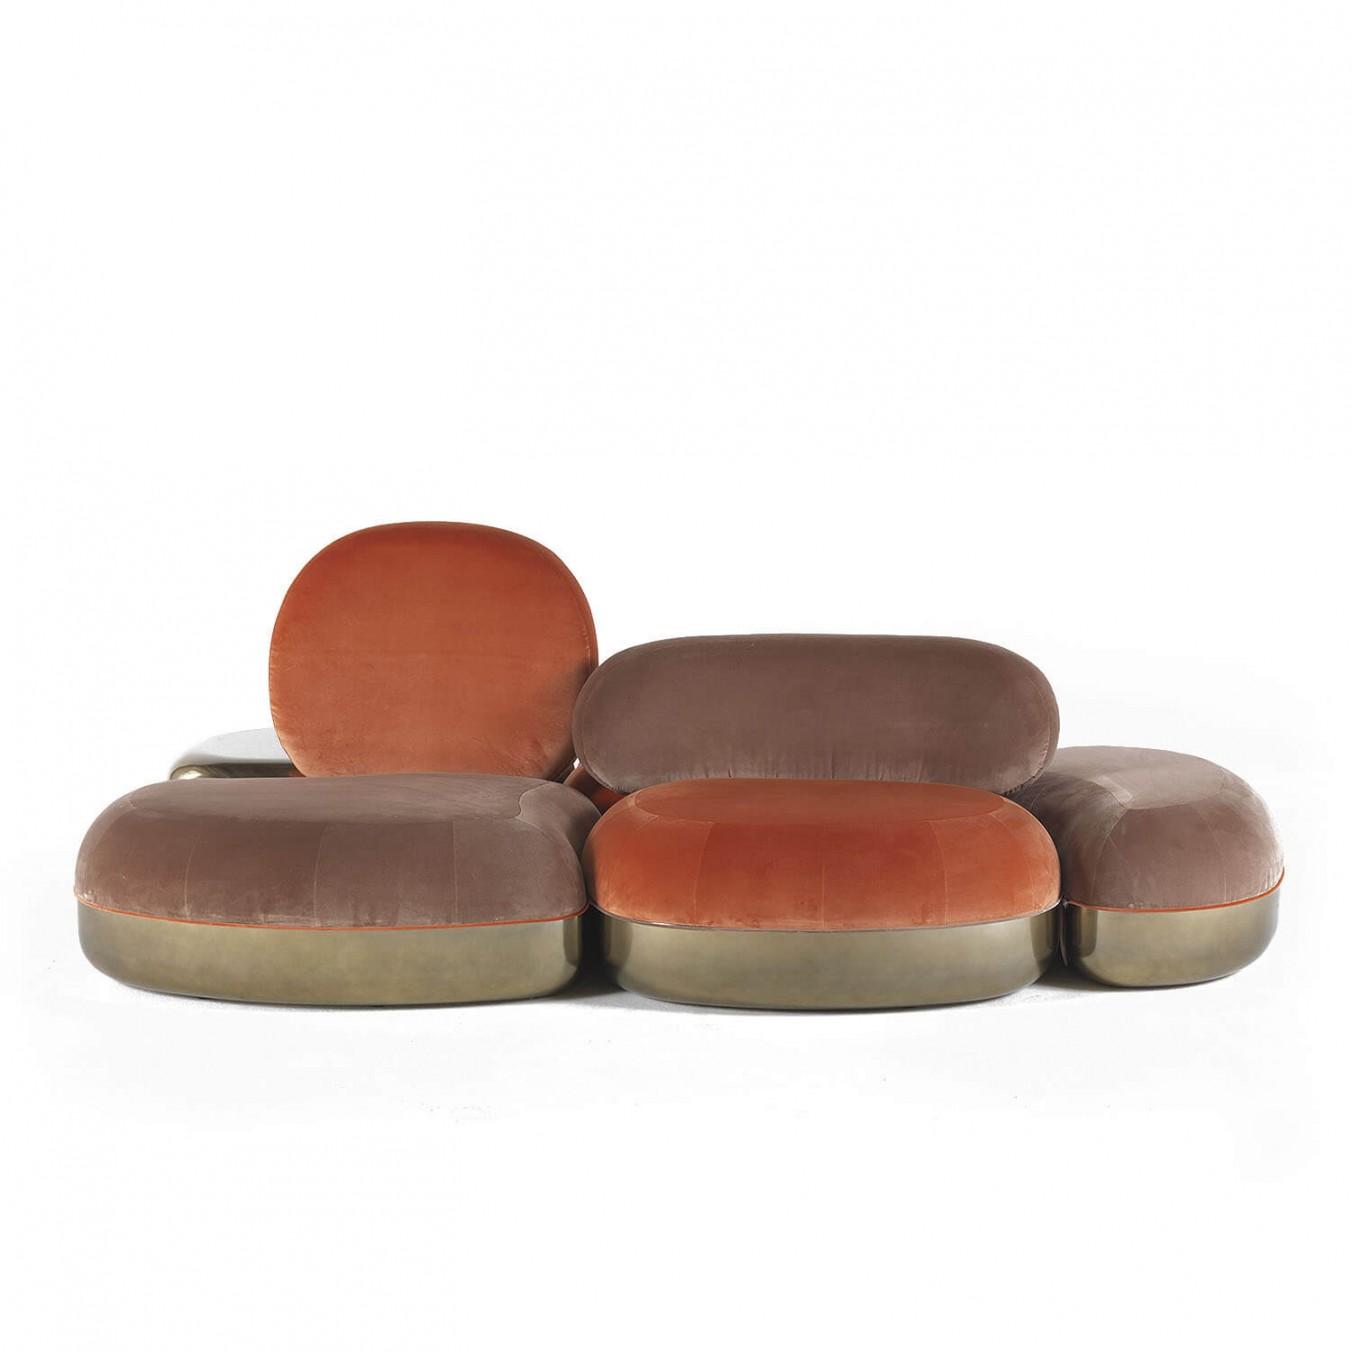 Belmer sofa